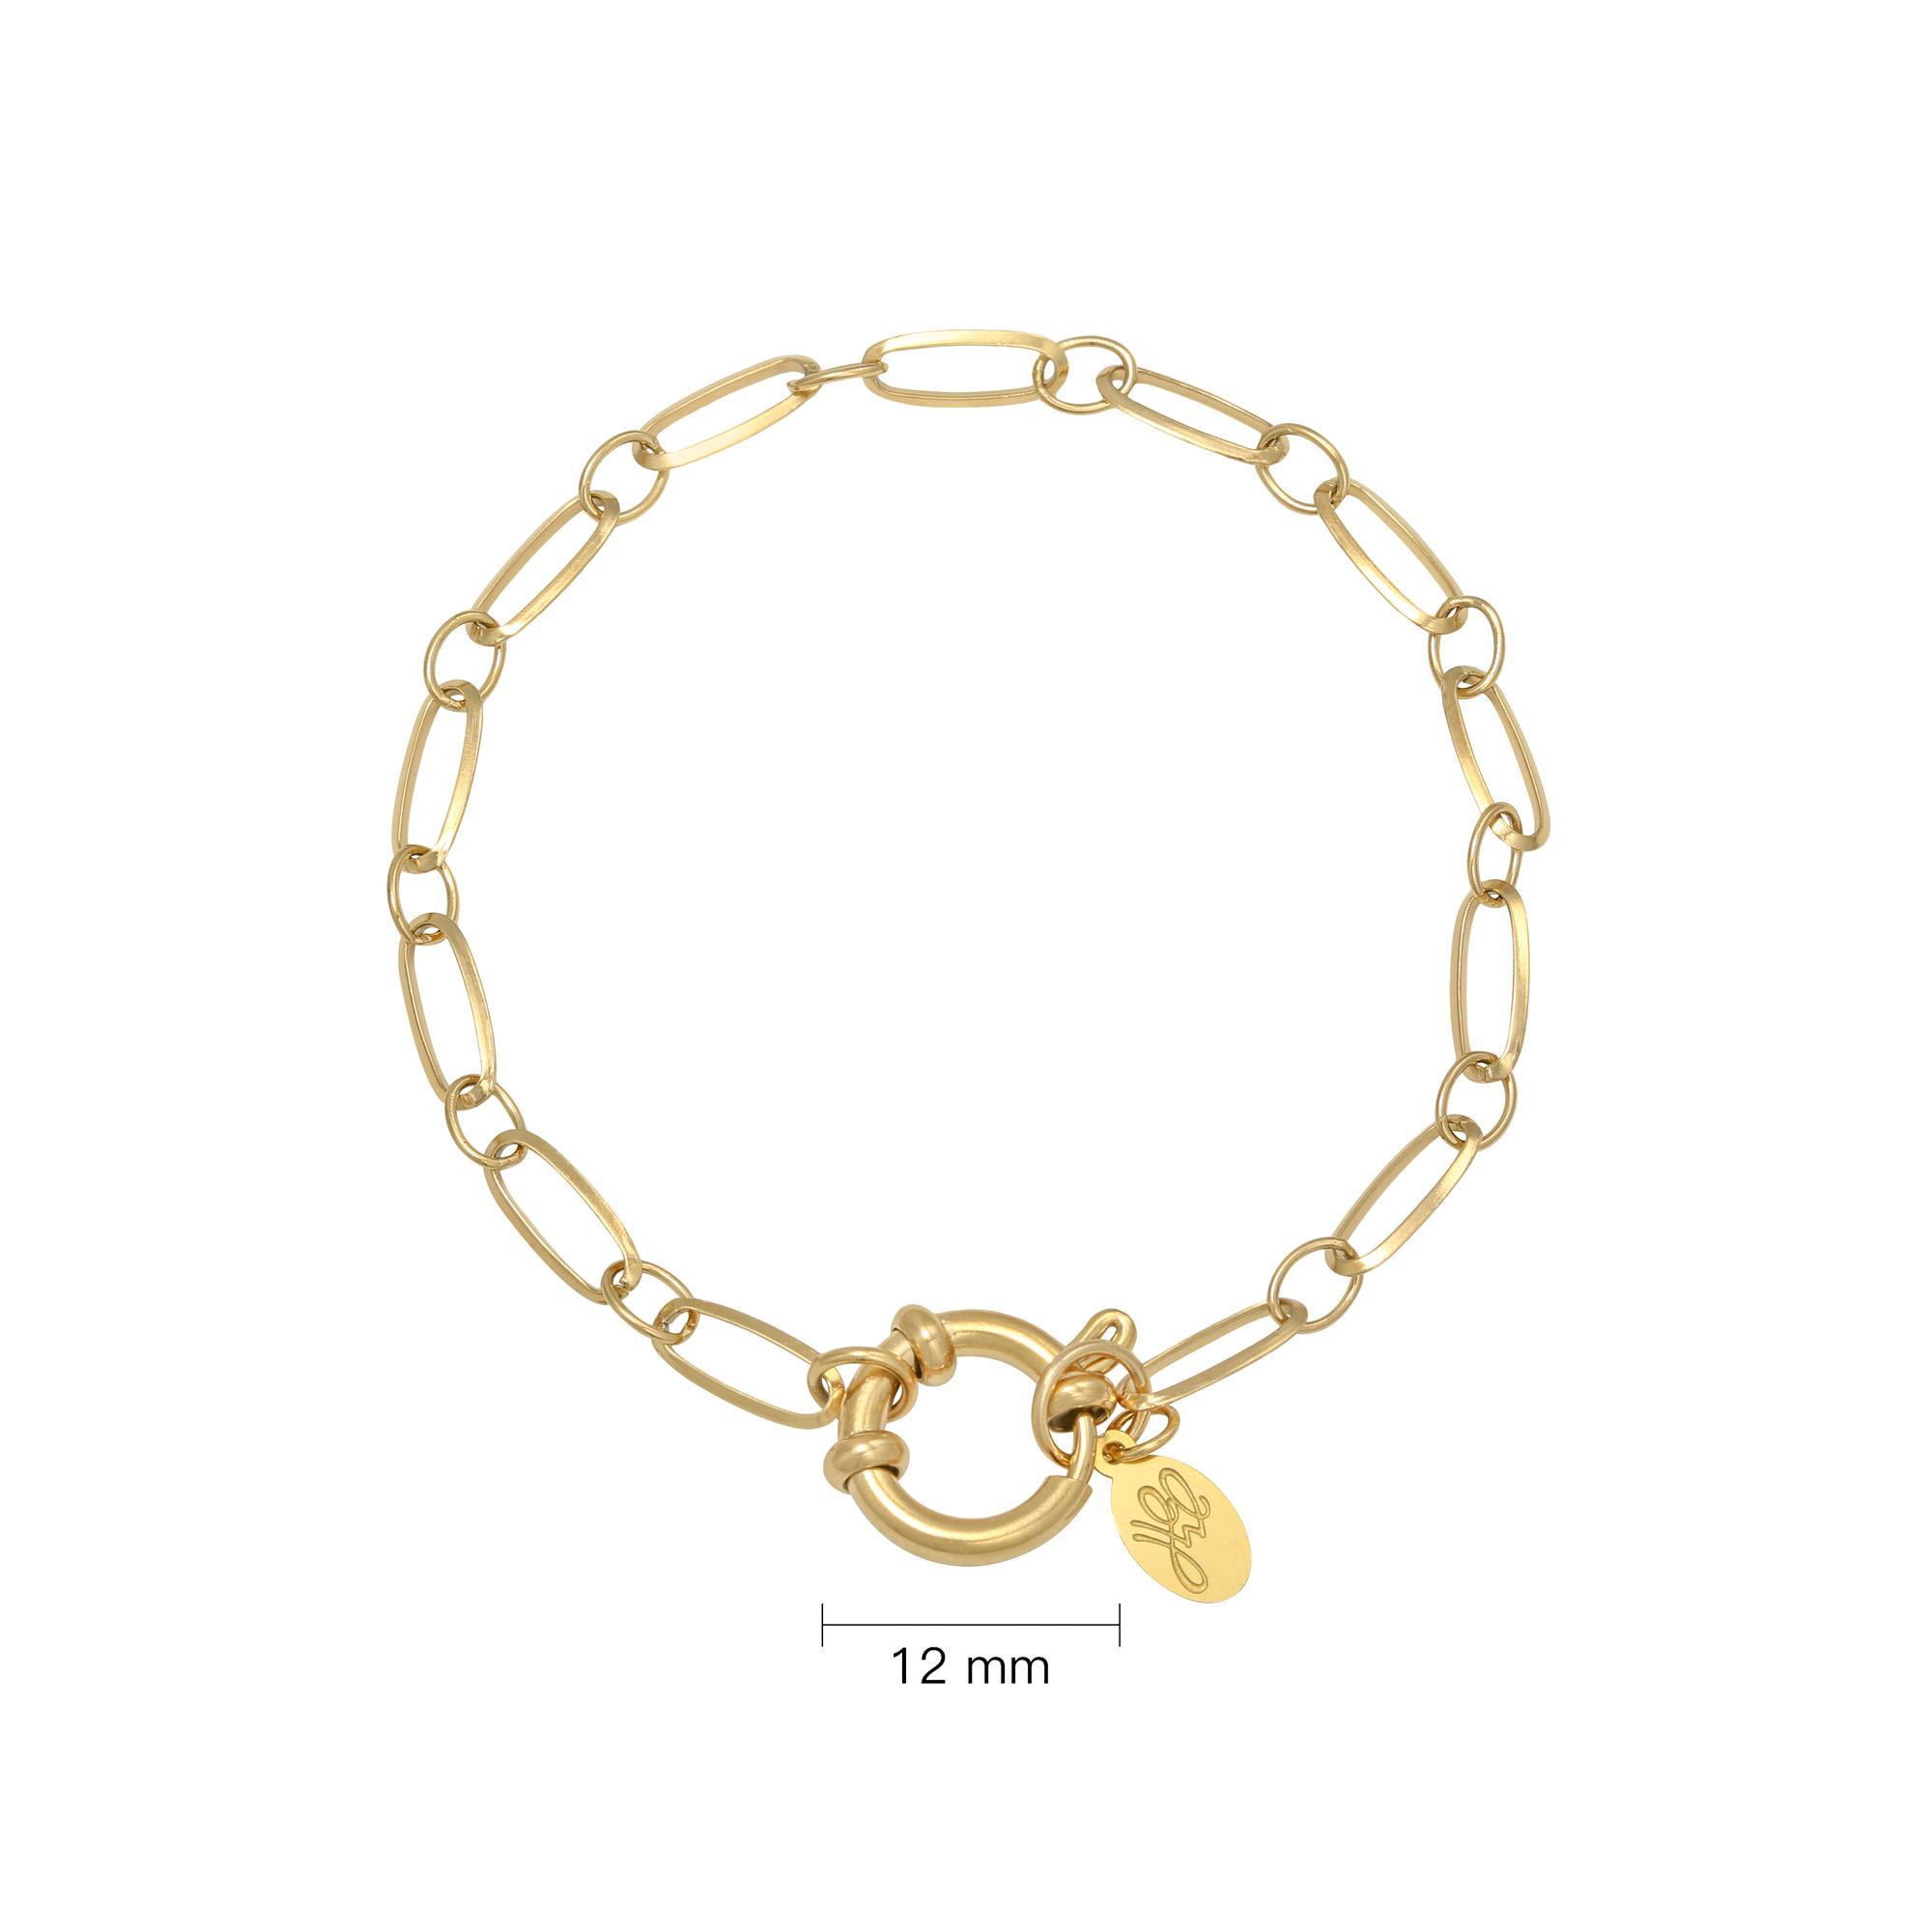 Armband Edelstahl vergoldet für Charms